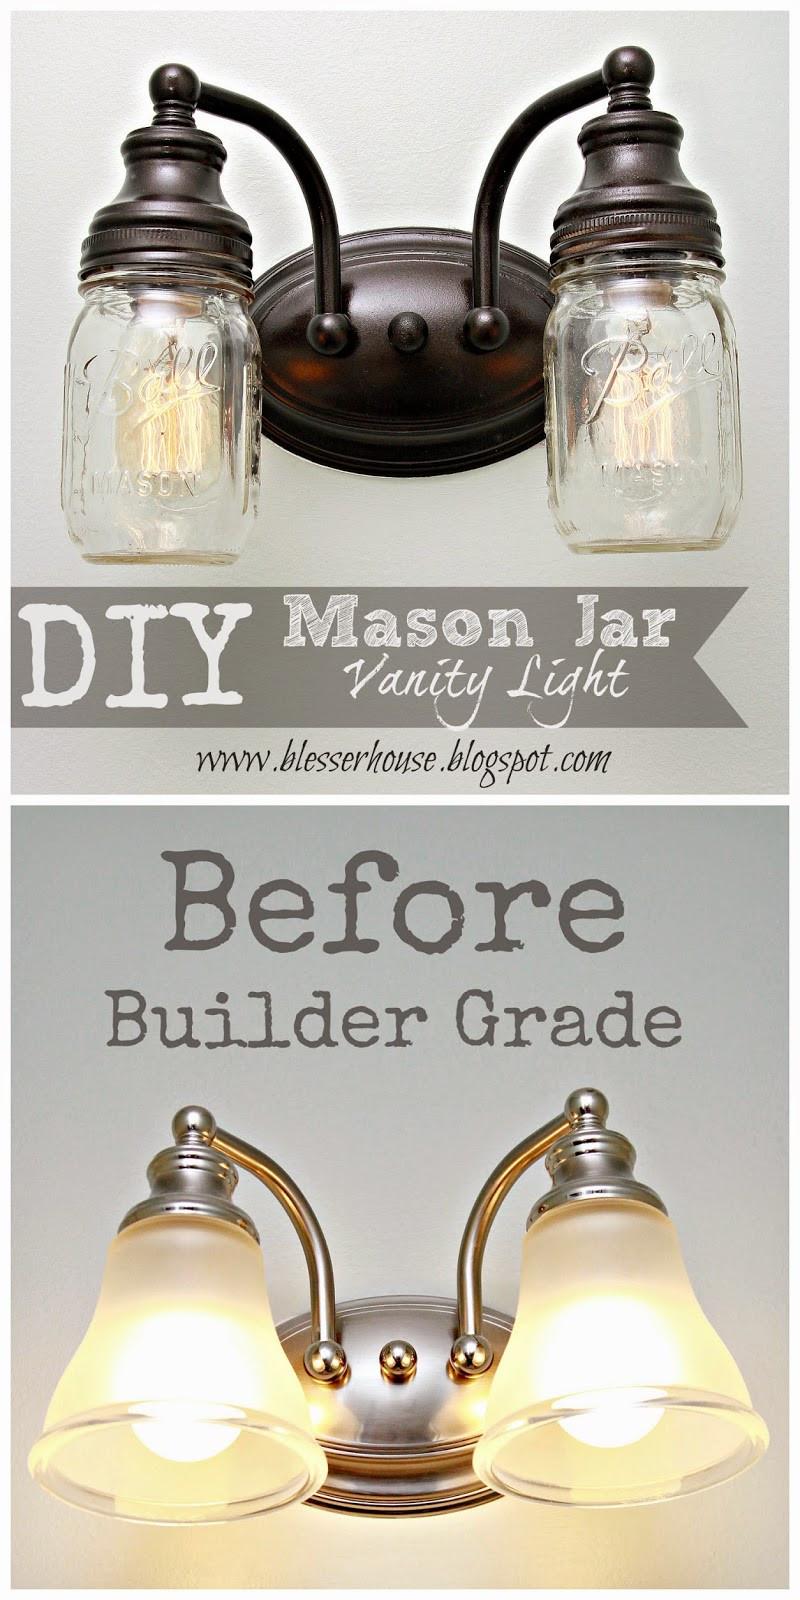 Best ideas about Mason Jar Lights DIY . Save or Pin DIY Mason Jar Vanity Light Bless er House Now.